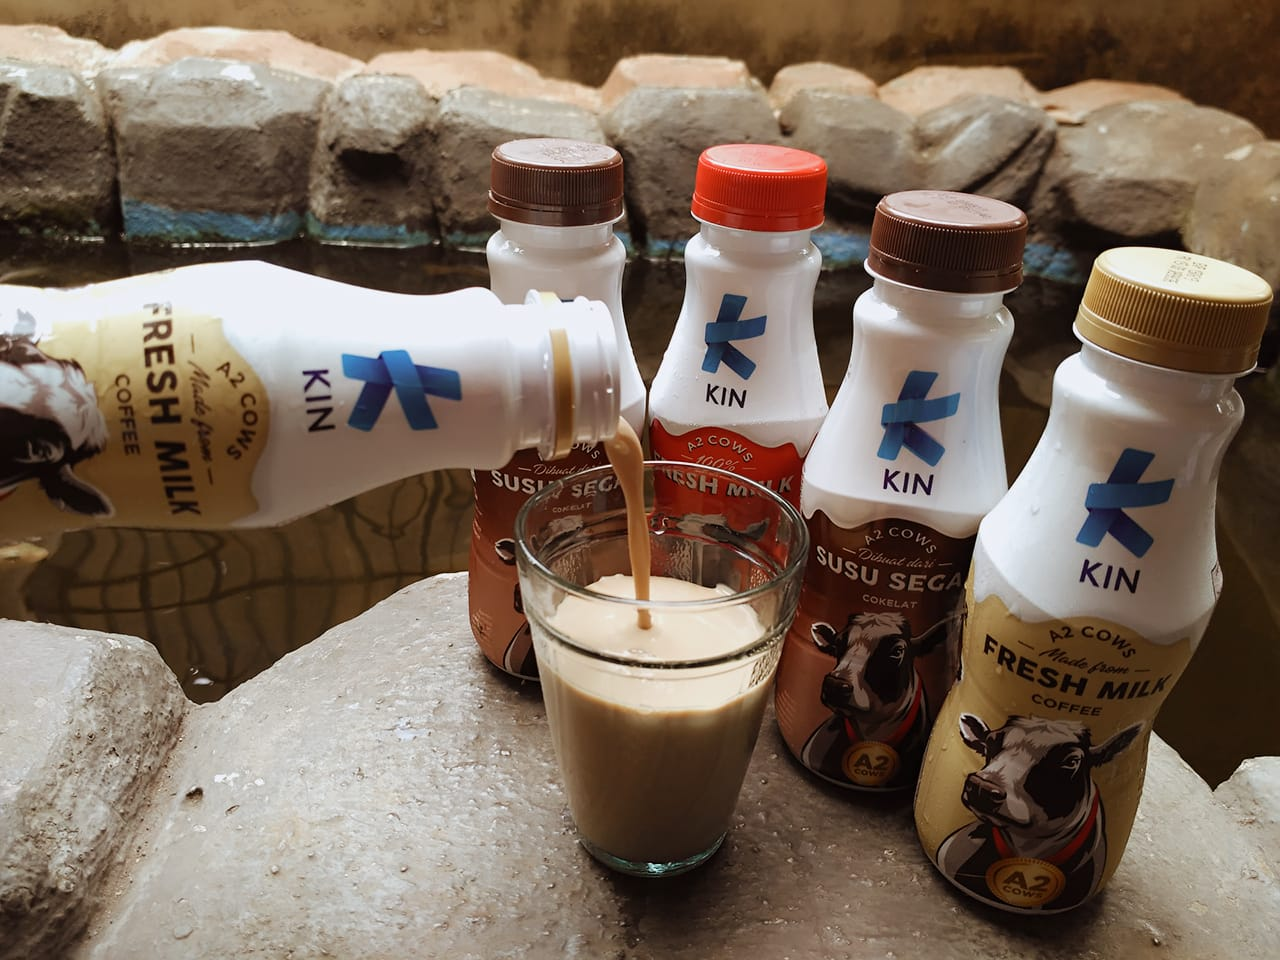 KINFresh Milk 2